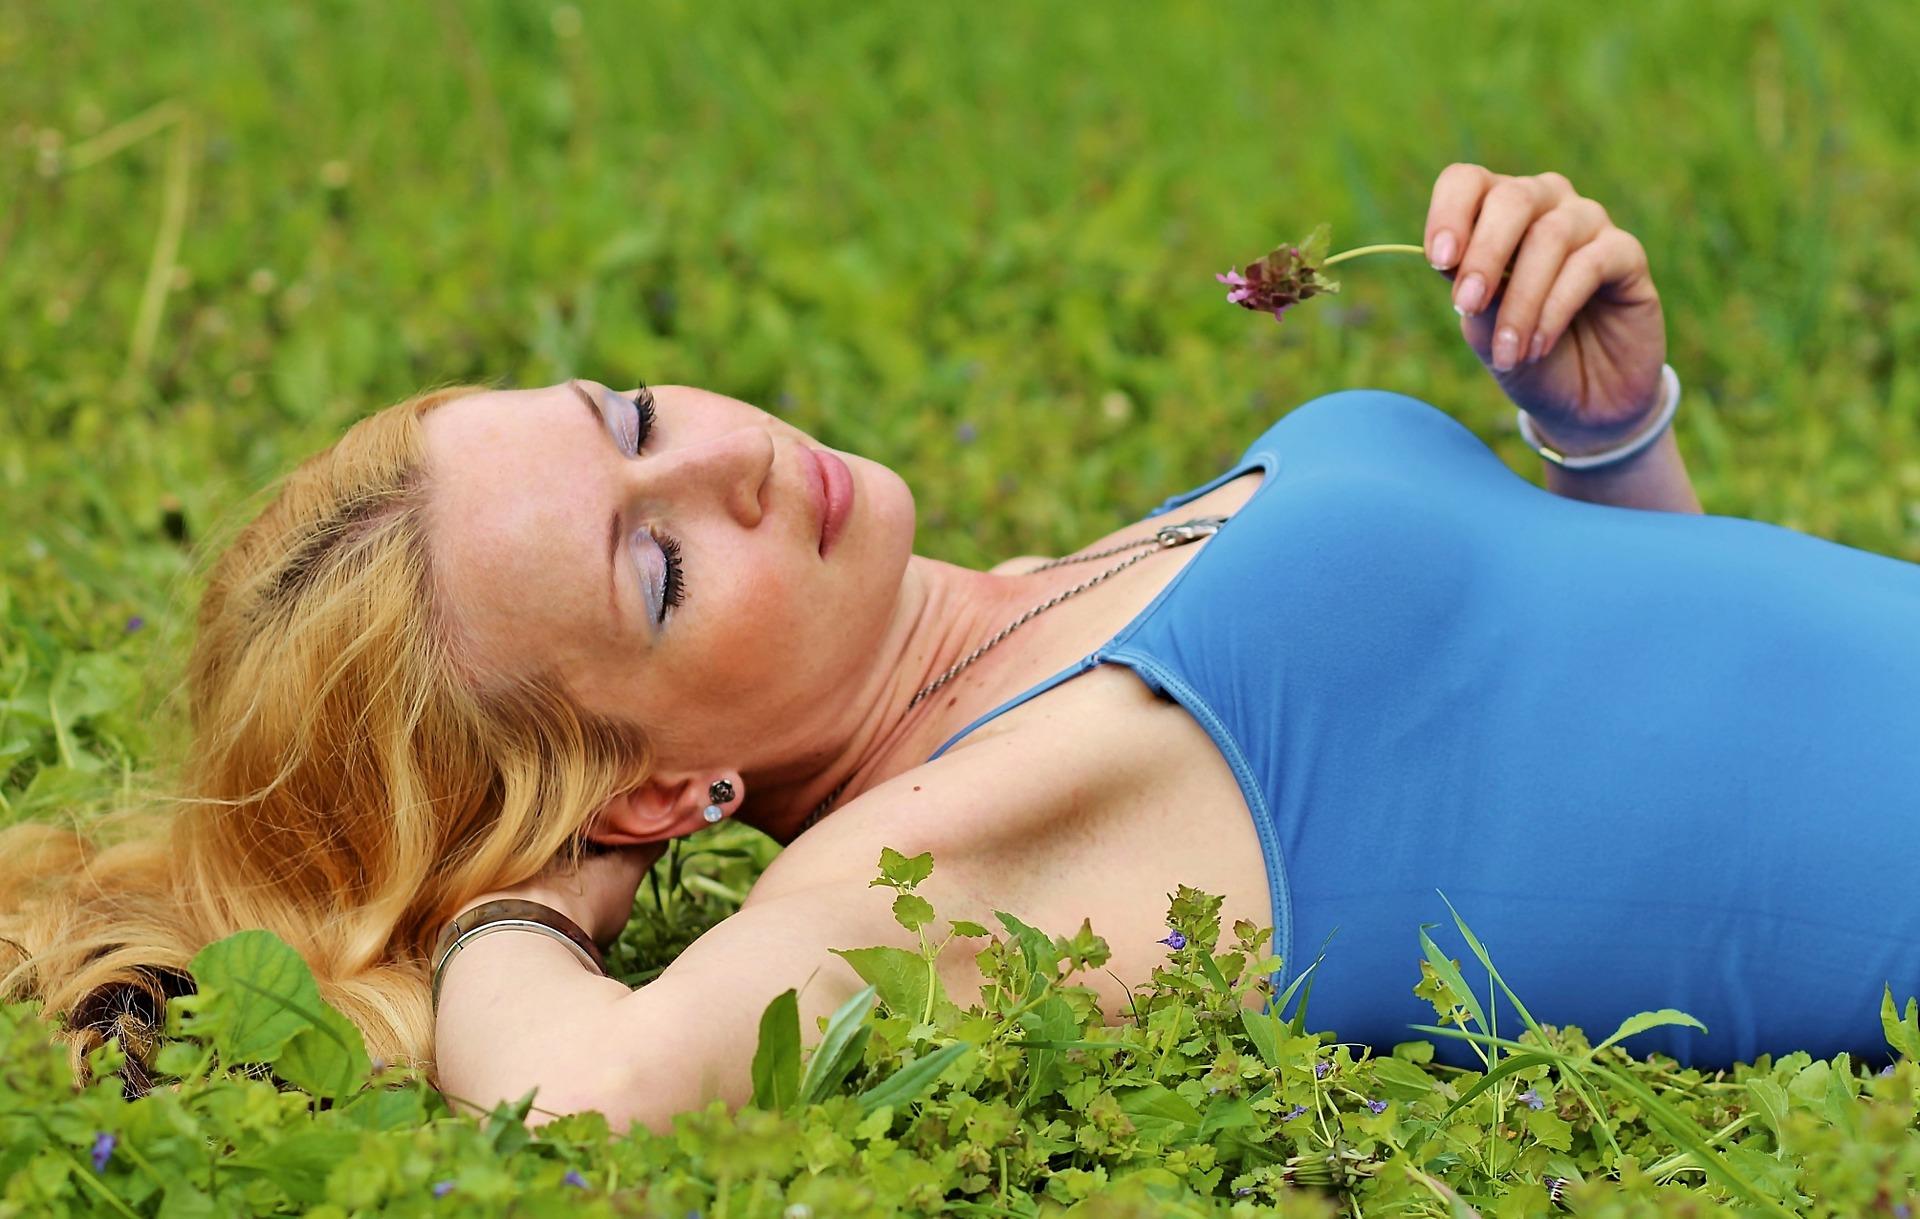 blonde-woman-1339848_1920